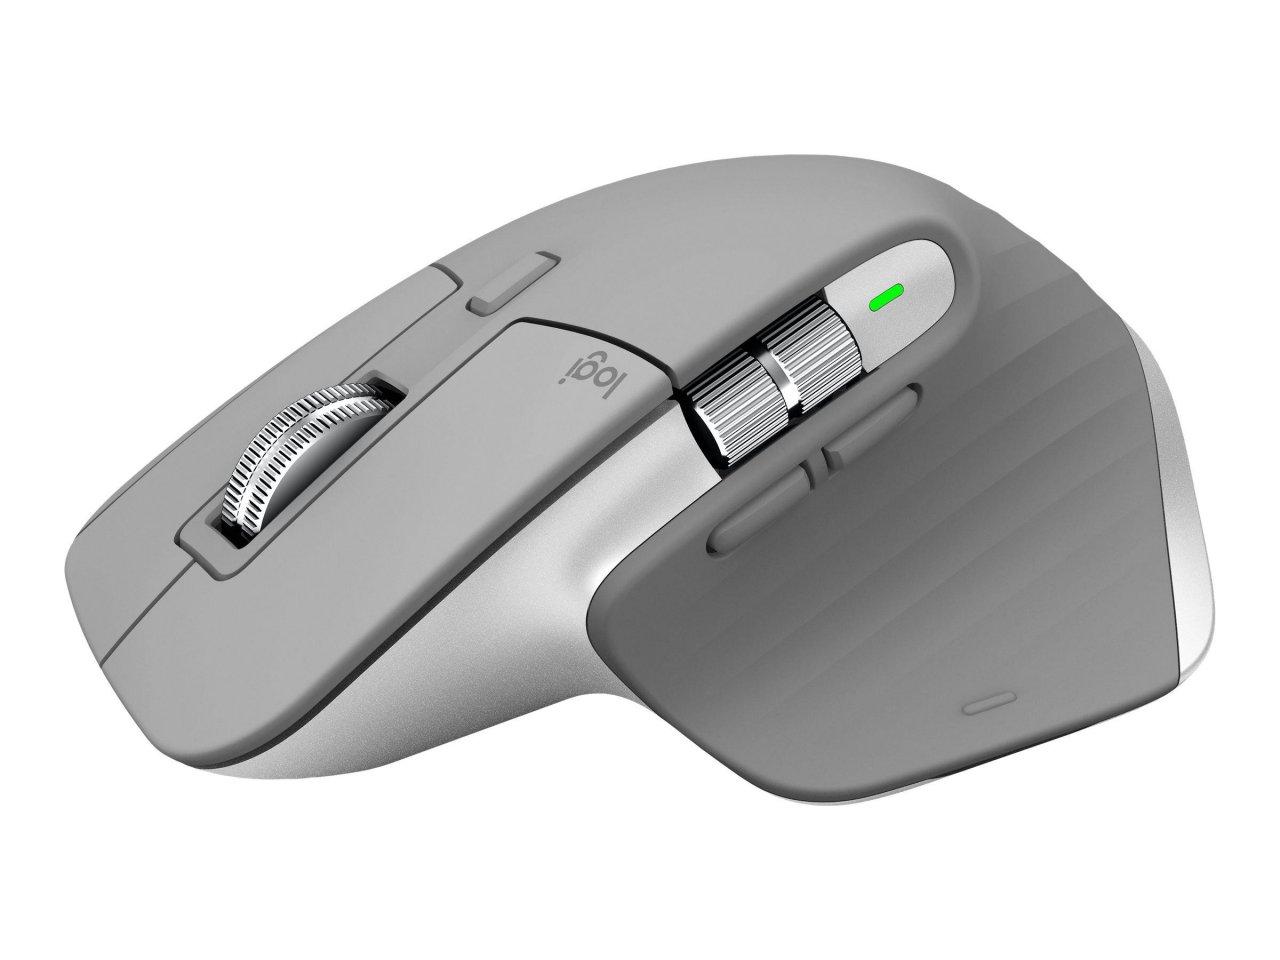 Logitech MX Master 3 Mid Grau 910-005695